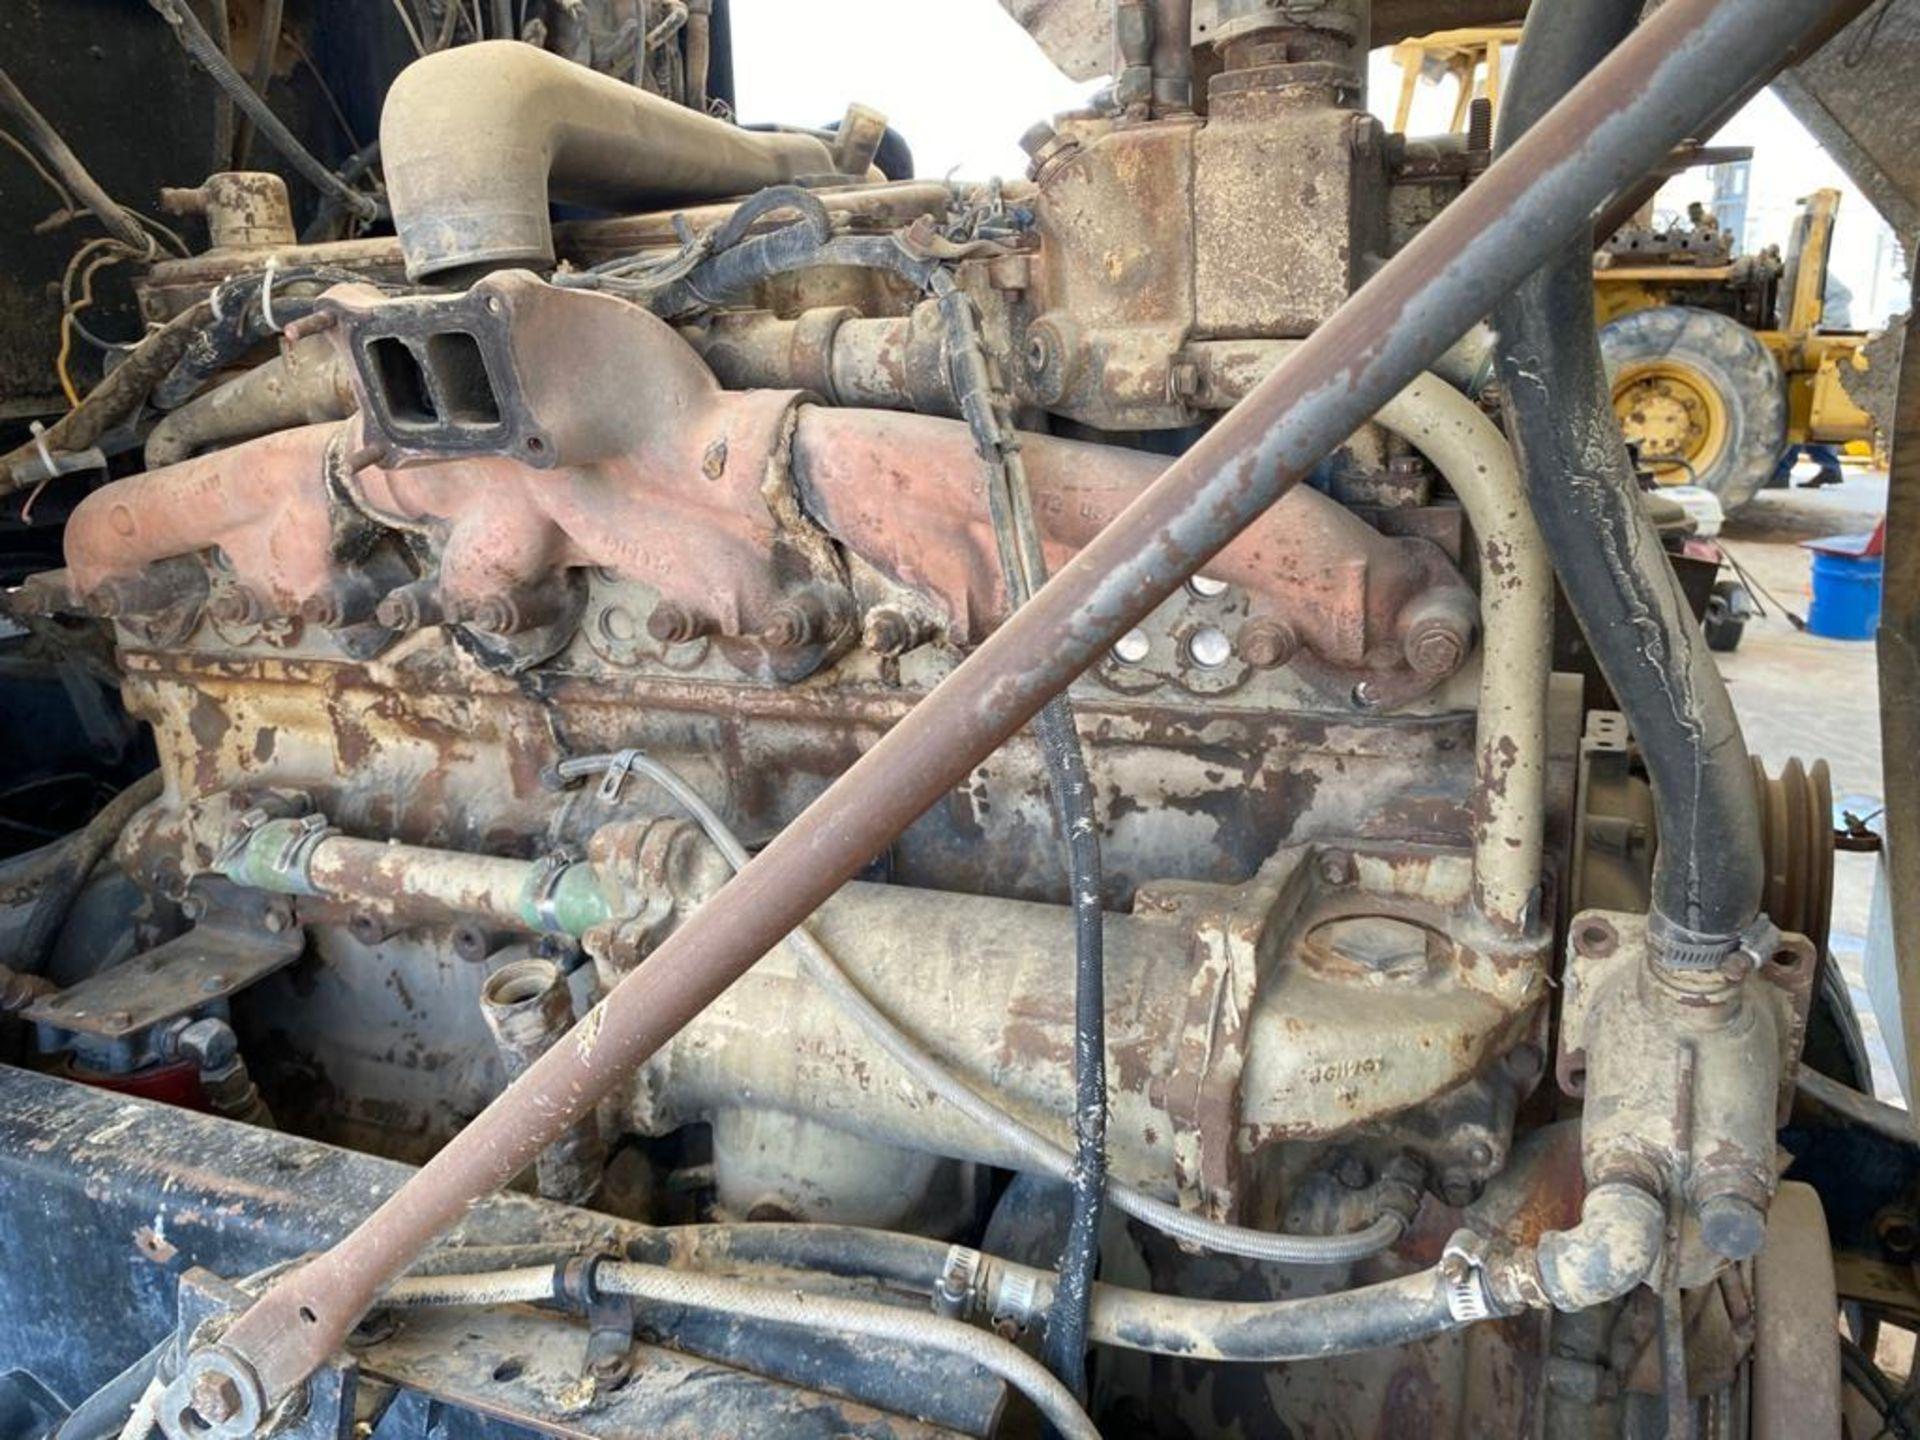 1983 Kenworth Dump Truck, standard transmission of 10 speeds, with Cummins motor - Image 37 of 68